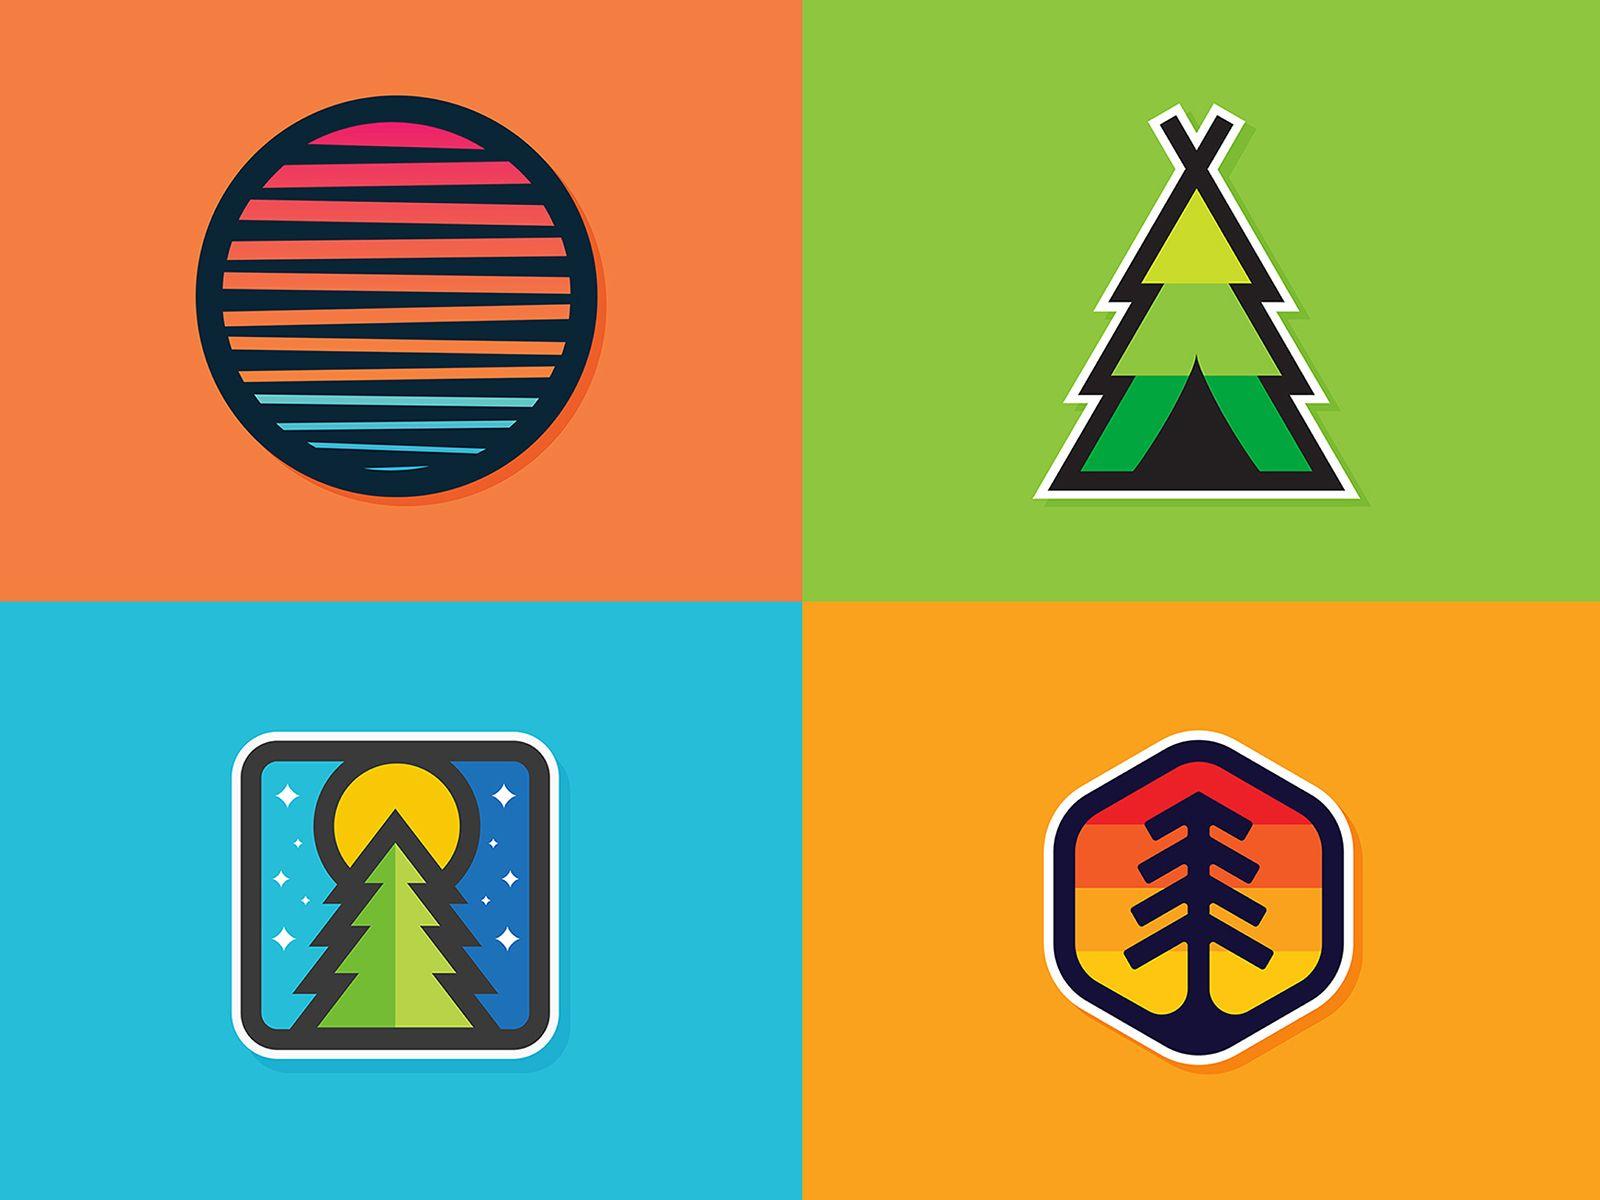 Sticker Shop https://dribbble.com/shots/2936578-Sticker-Shop #digitalart #art #graphics #graphicdesign #illustration #sticker #icon #dribbble